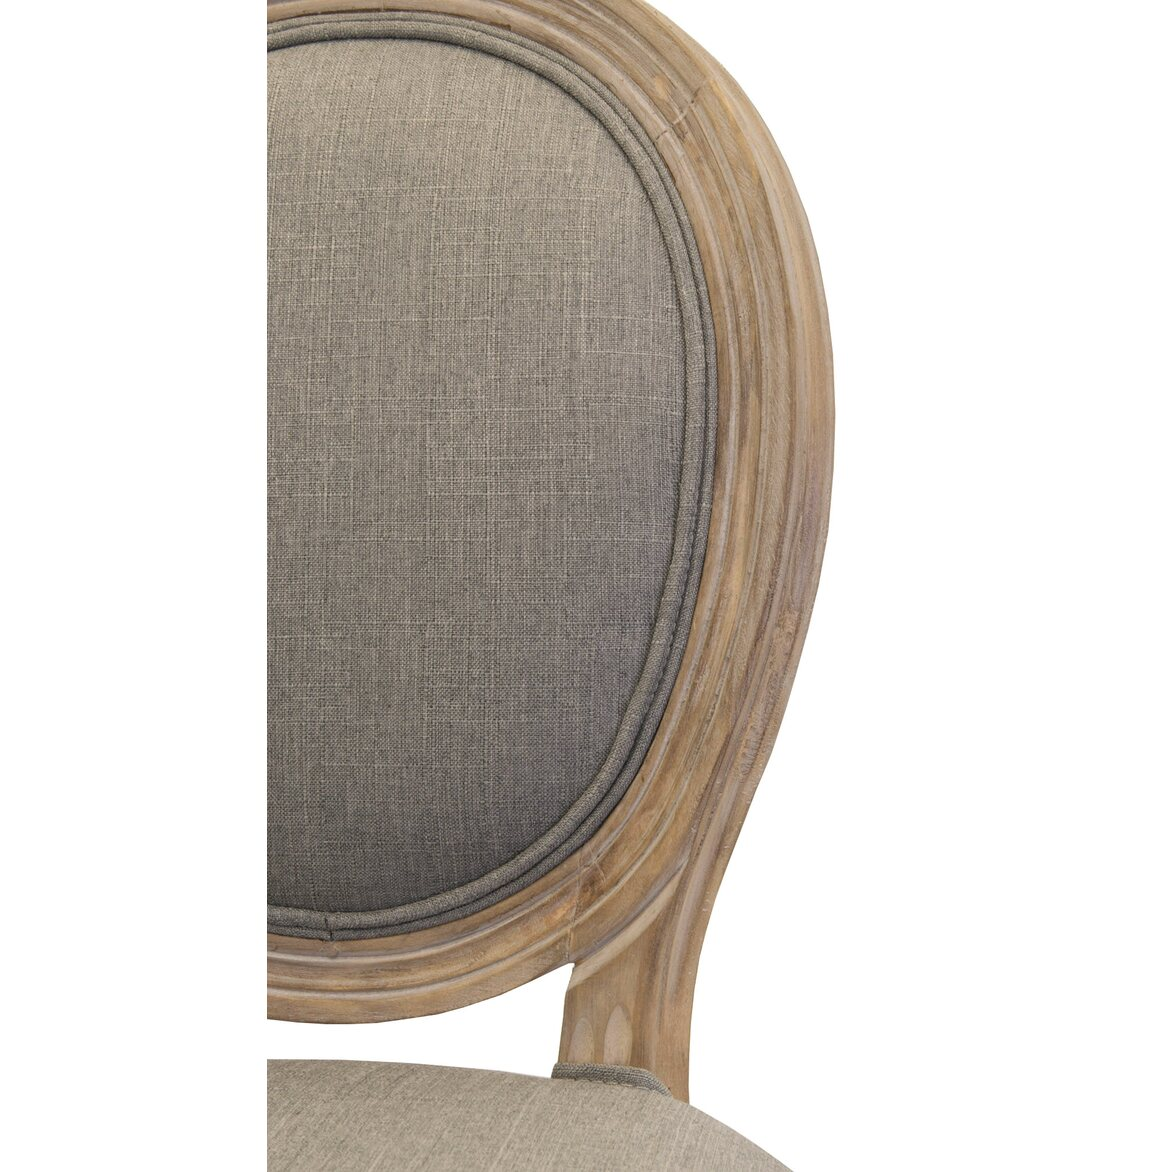 Стул Volker grey 5 | Обеденные стулья Kingsby